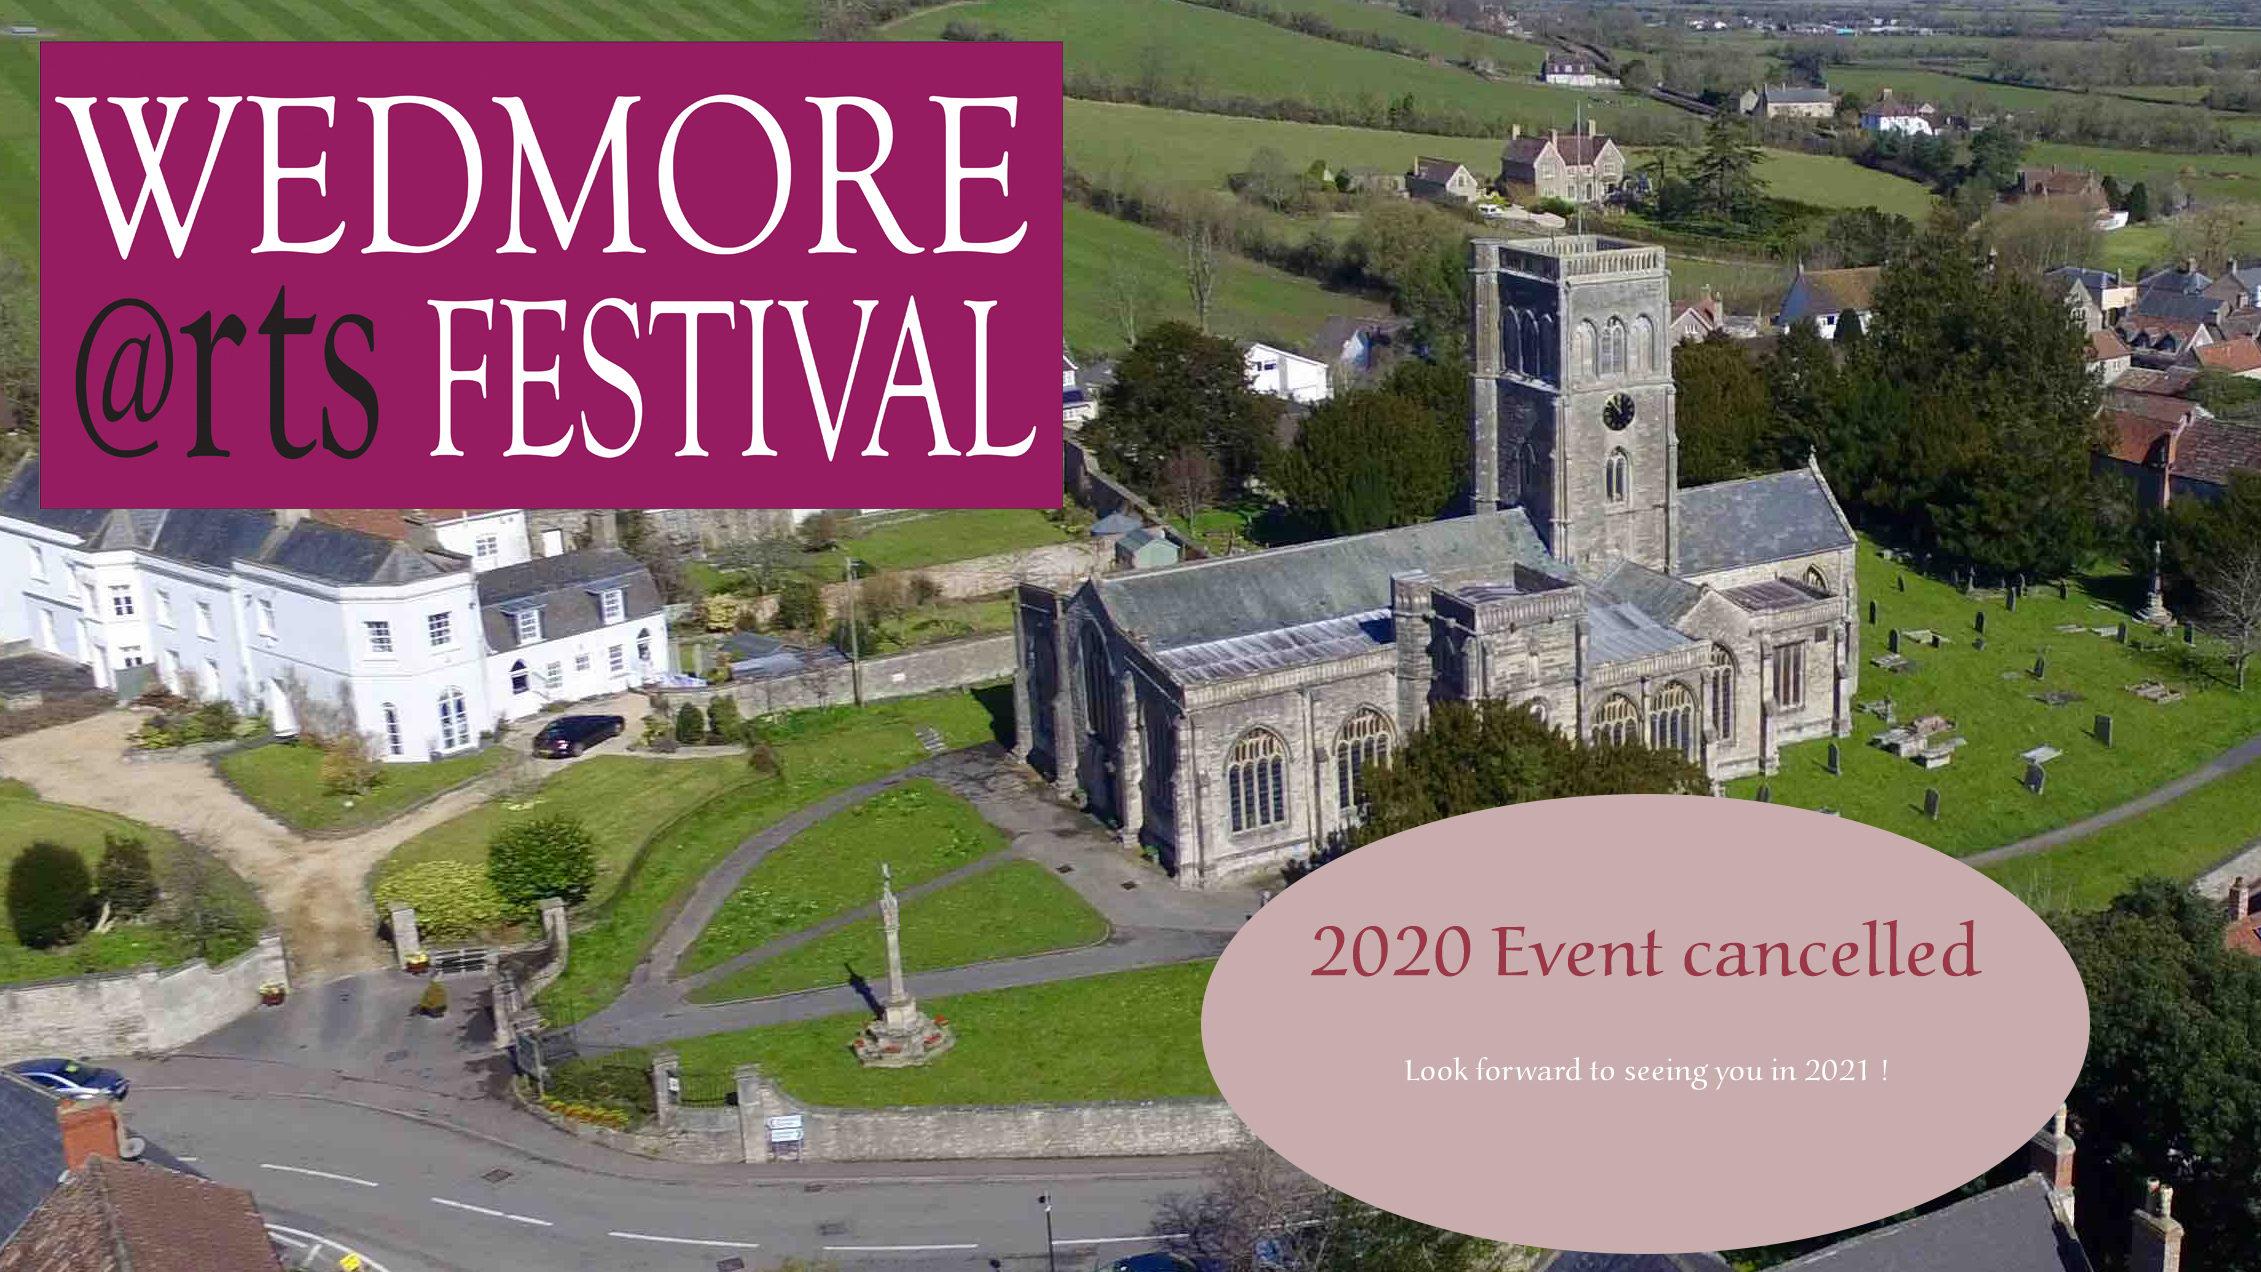 Wedmore Arts Festival 2020